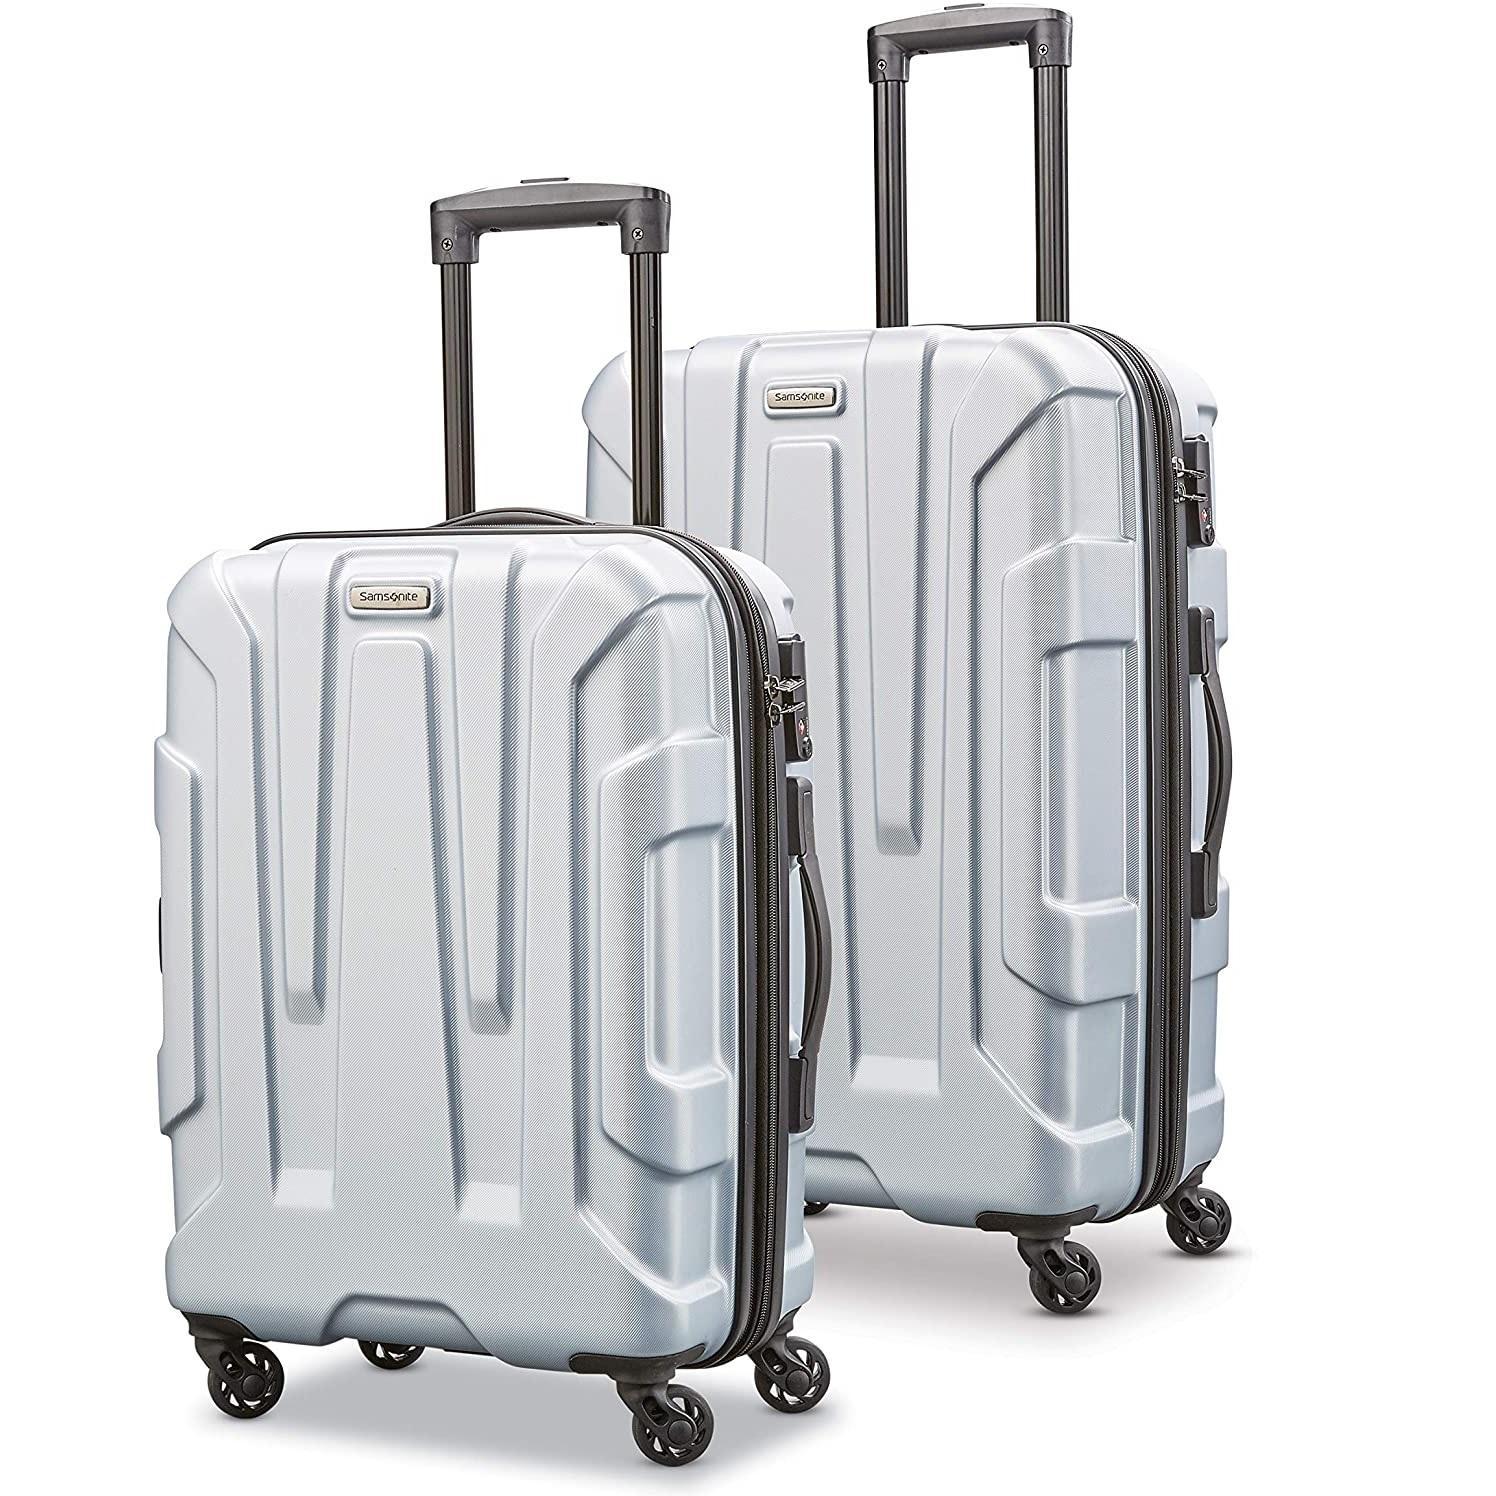 Samsonite 新秀丽 Centric 万向轮行李箱2件套 20+24寸